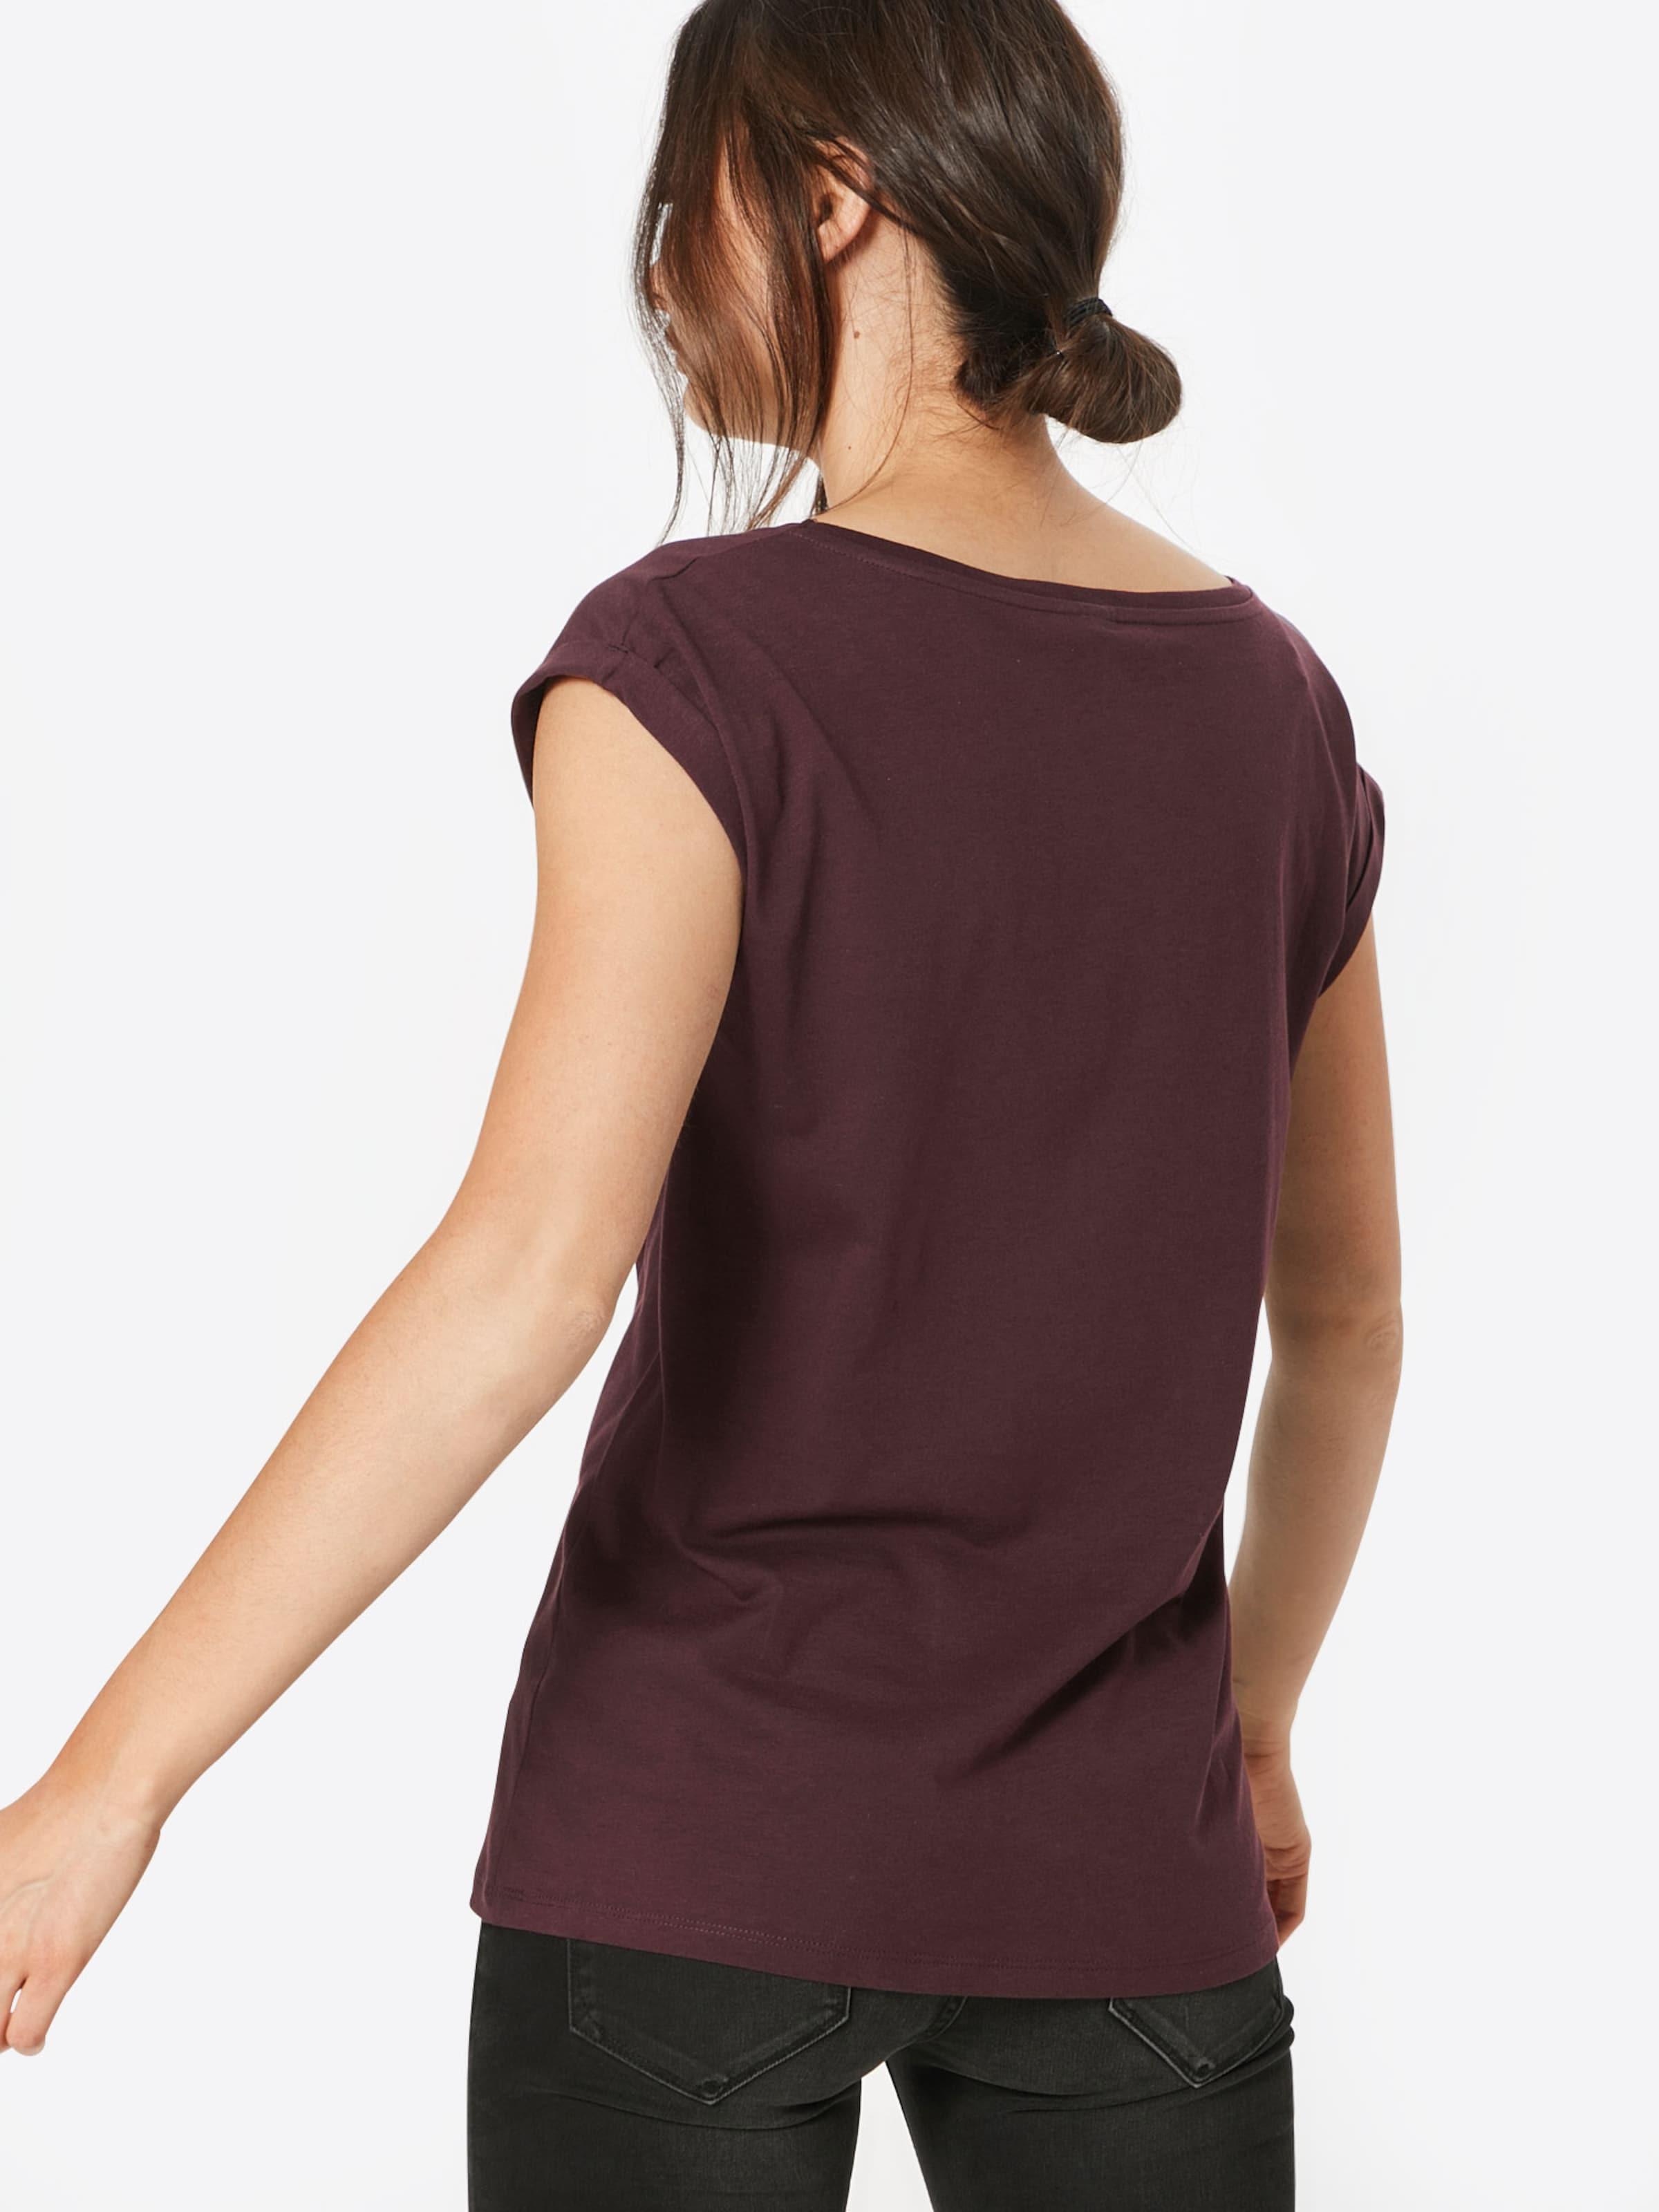 T En Aubergine 2' shirt 'skateowl Iriedaily YfvbyIg76